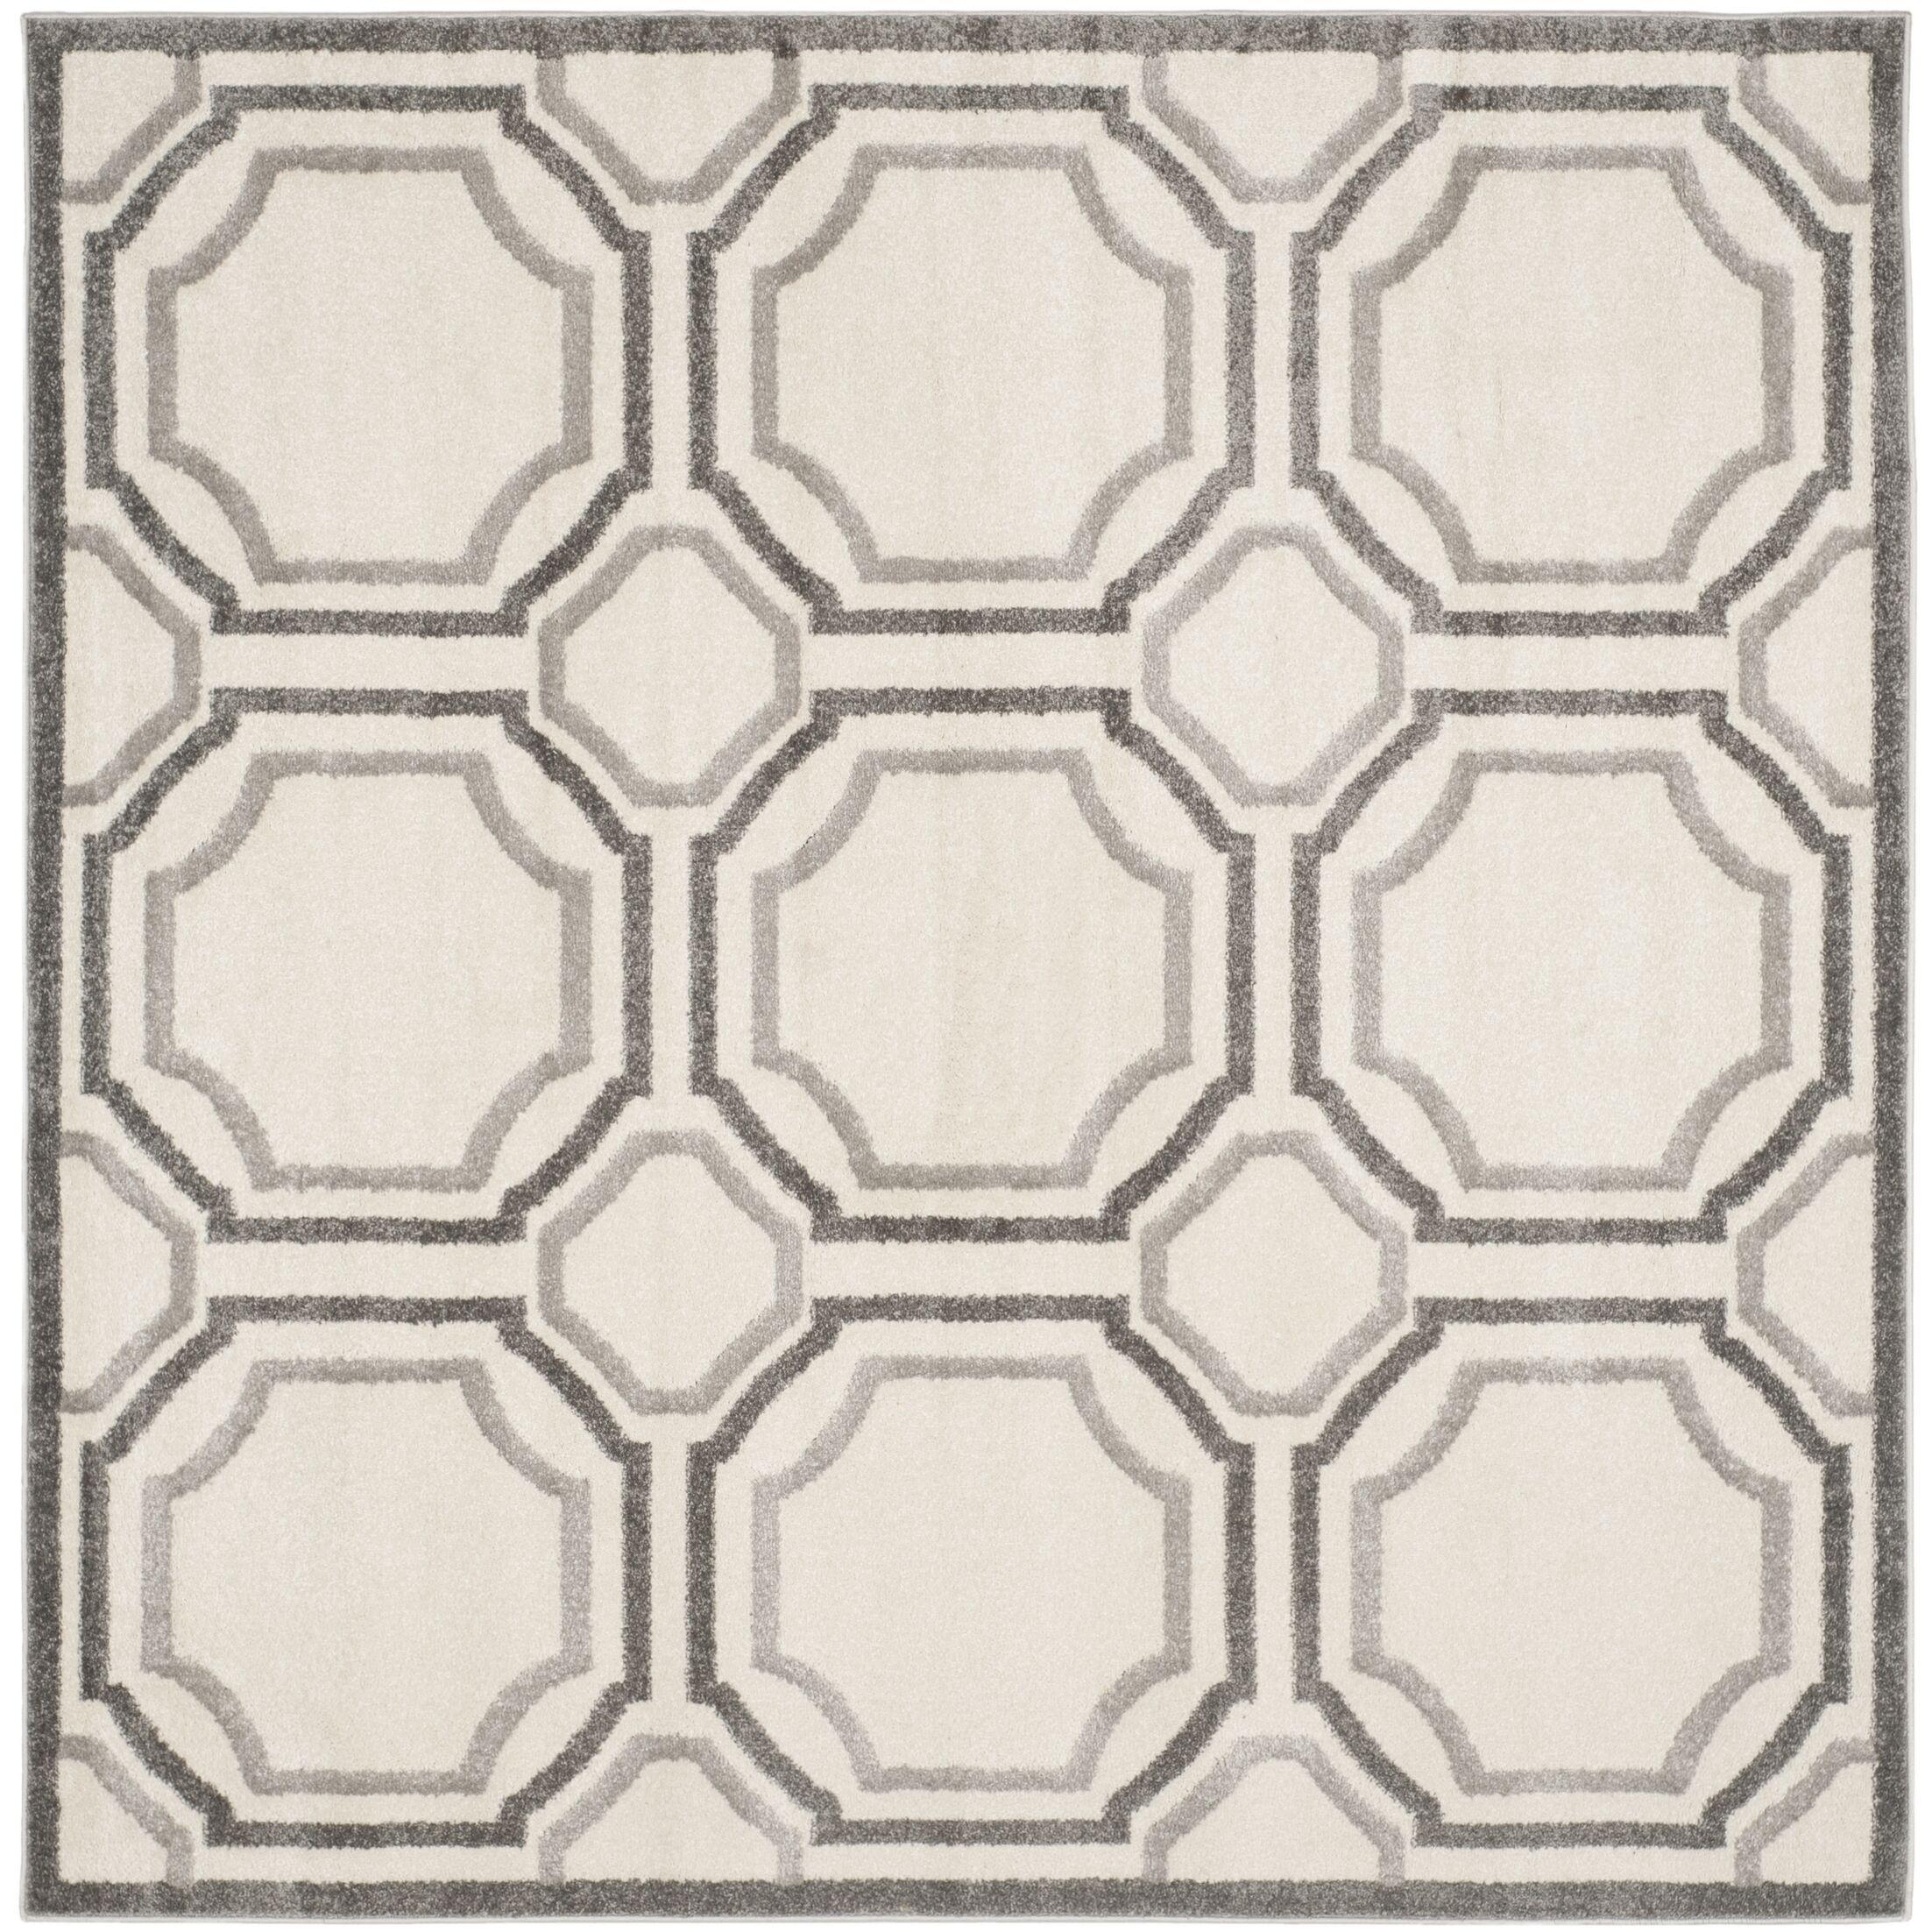 Maritza Ivory & Cream Area Rug Rug Size: Square 7'